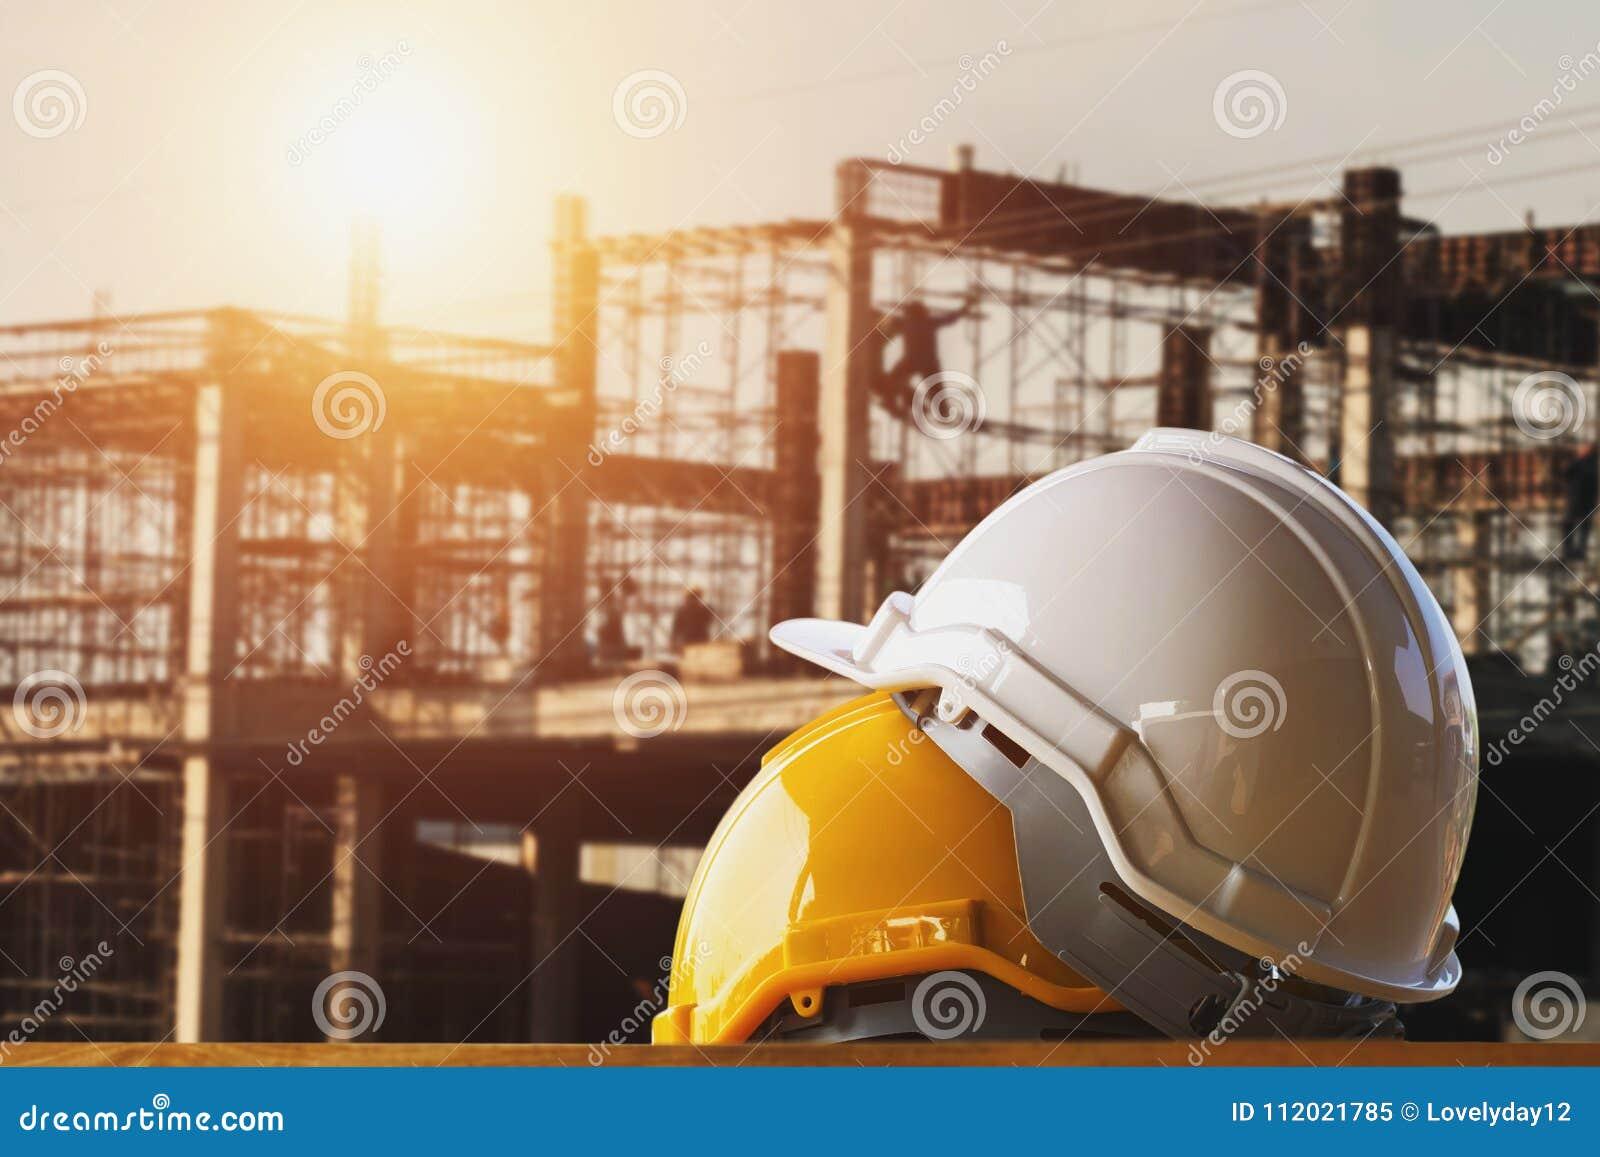 Witte en gele veiligheidshelm in bouwwerf